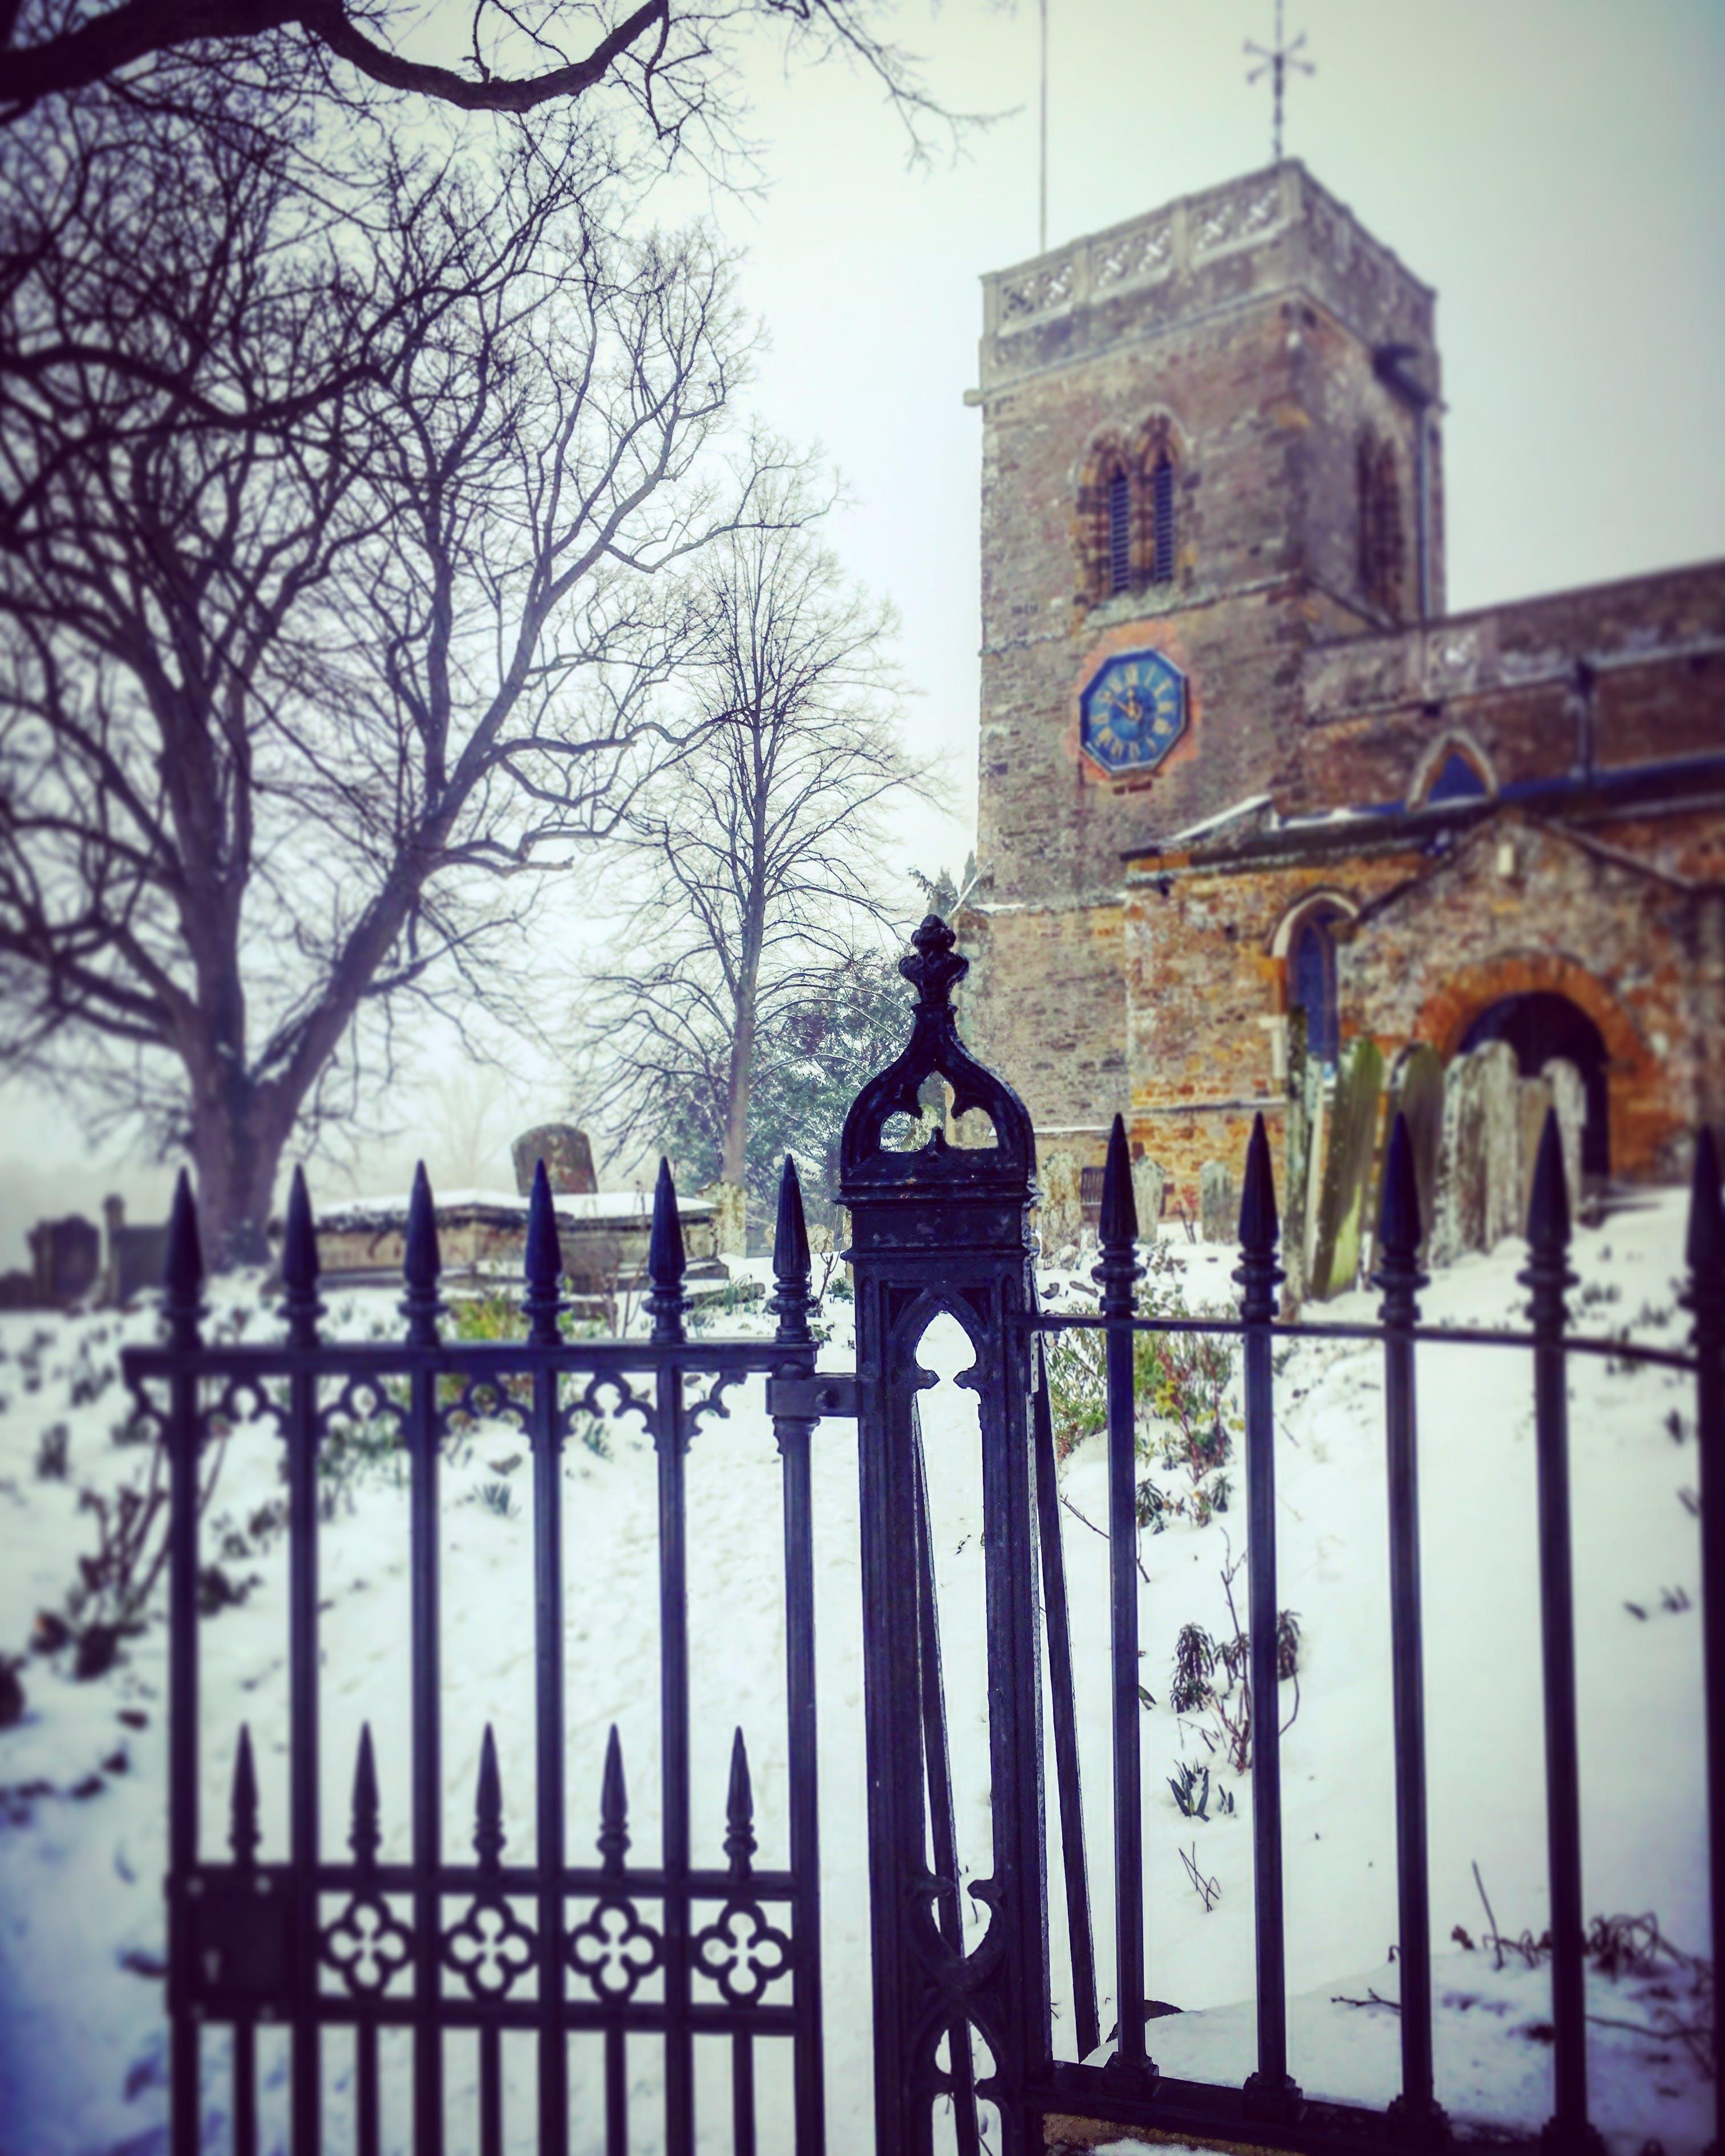 Free stock photo of Snowy church